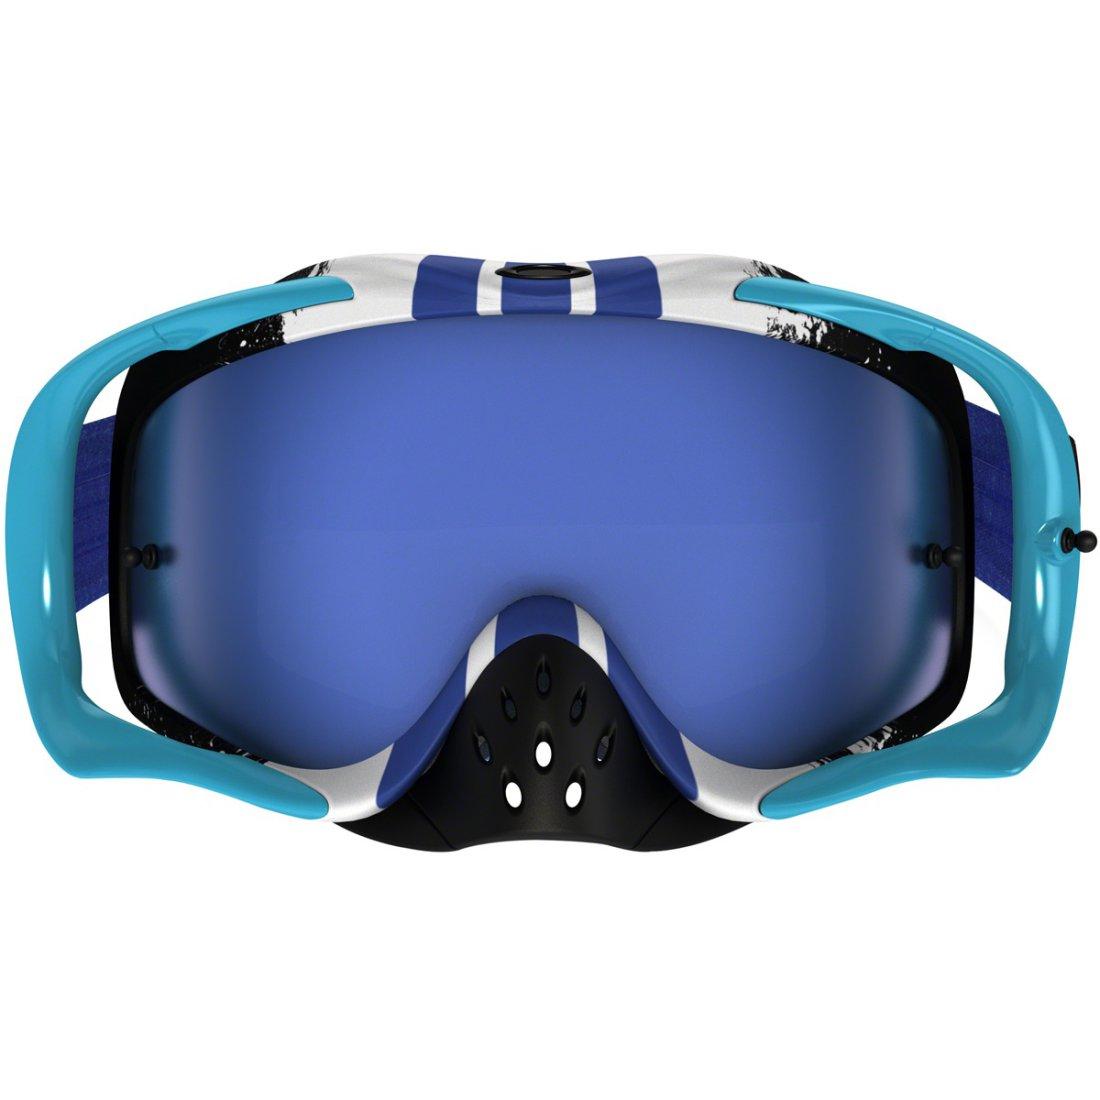 18482453ed OAKLEY Crowbar MX Pinned Race Blue   Black Ice Iridium Goggles ...